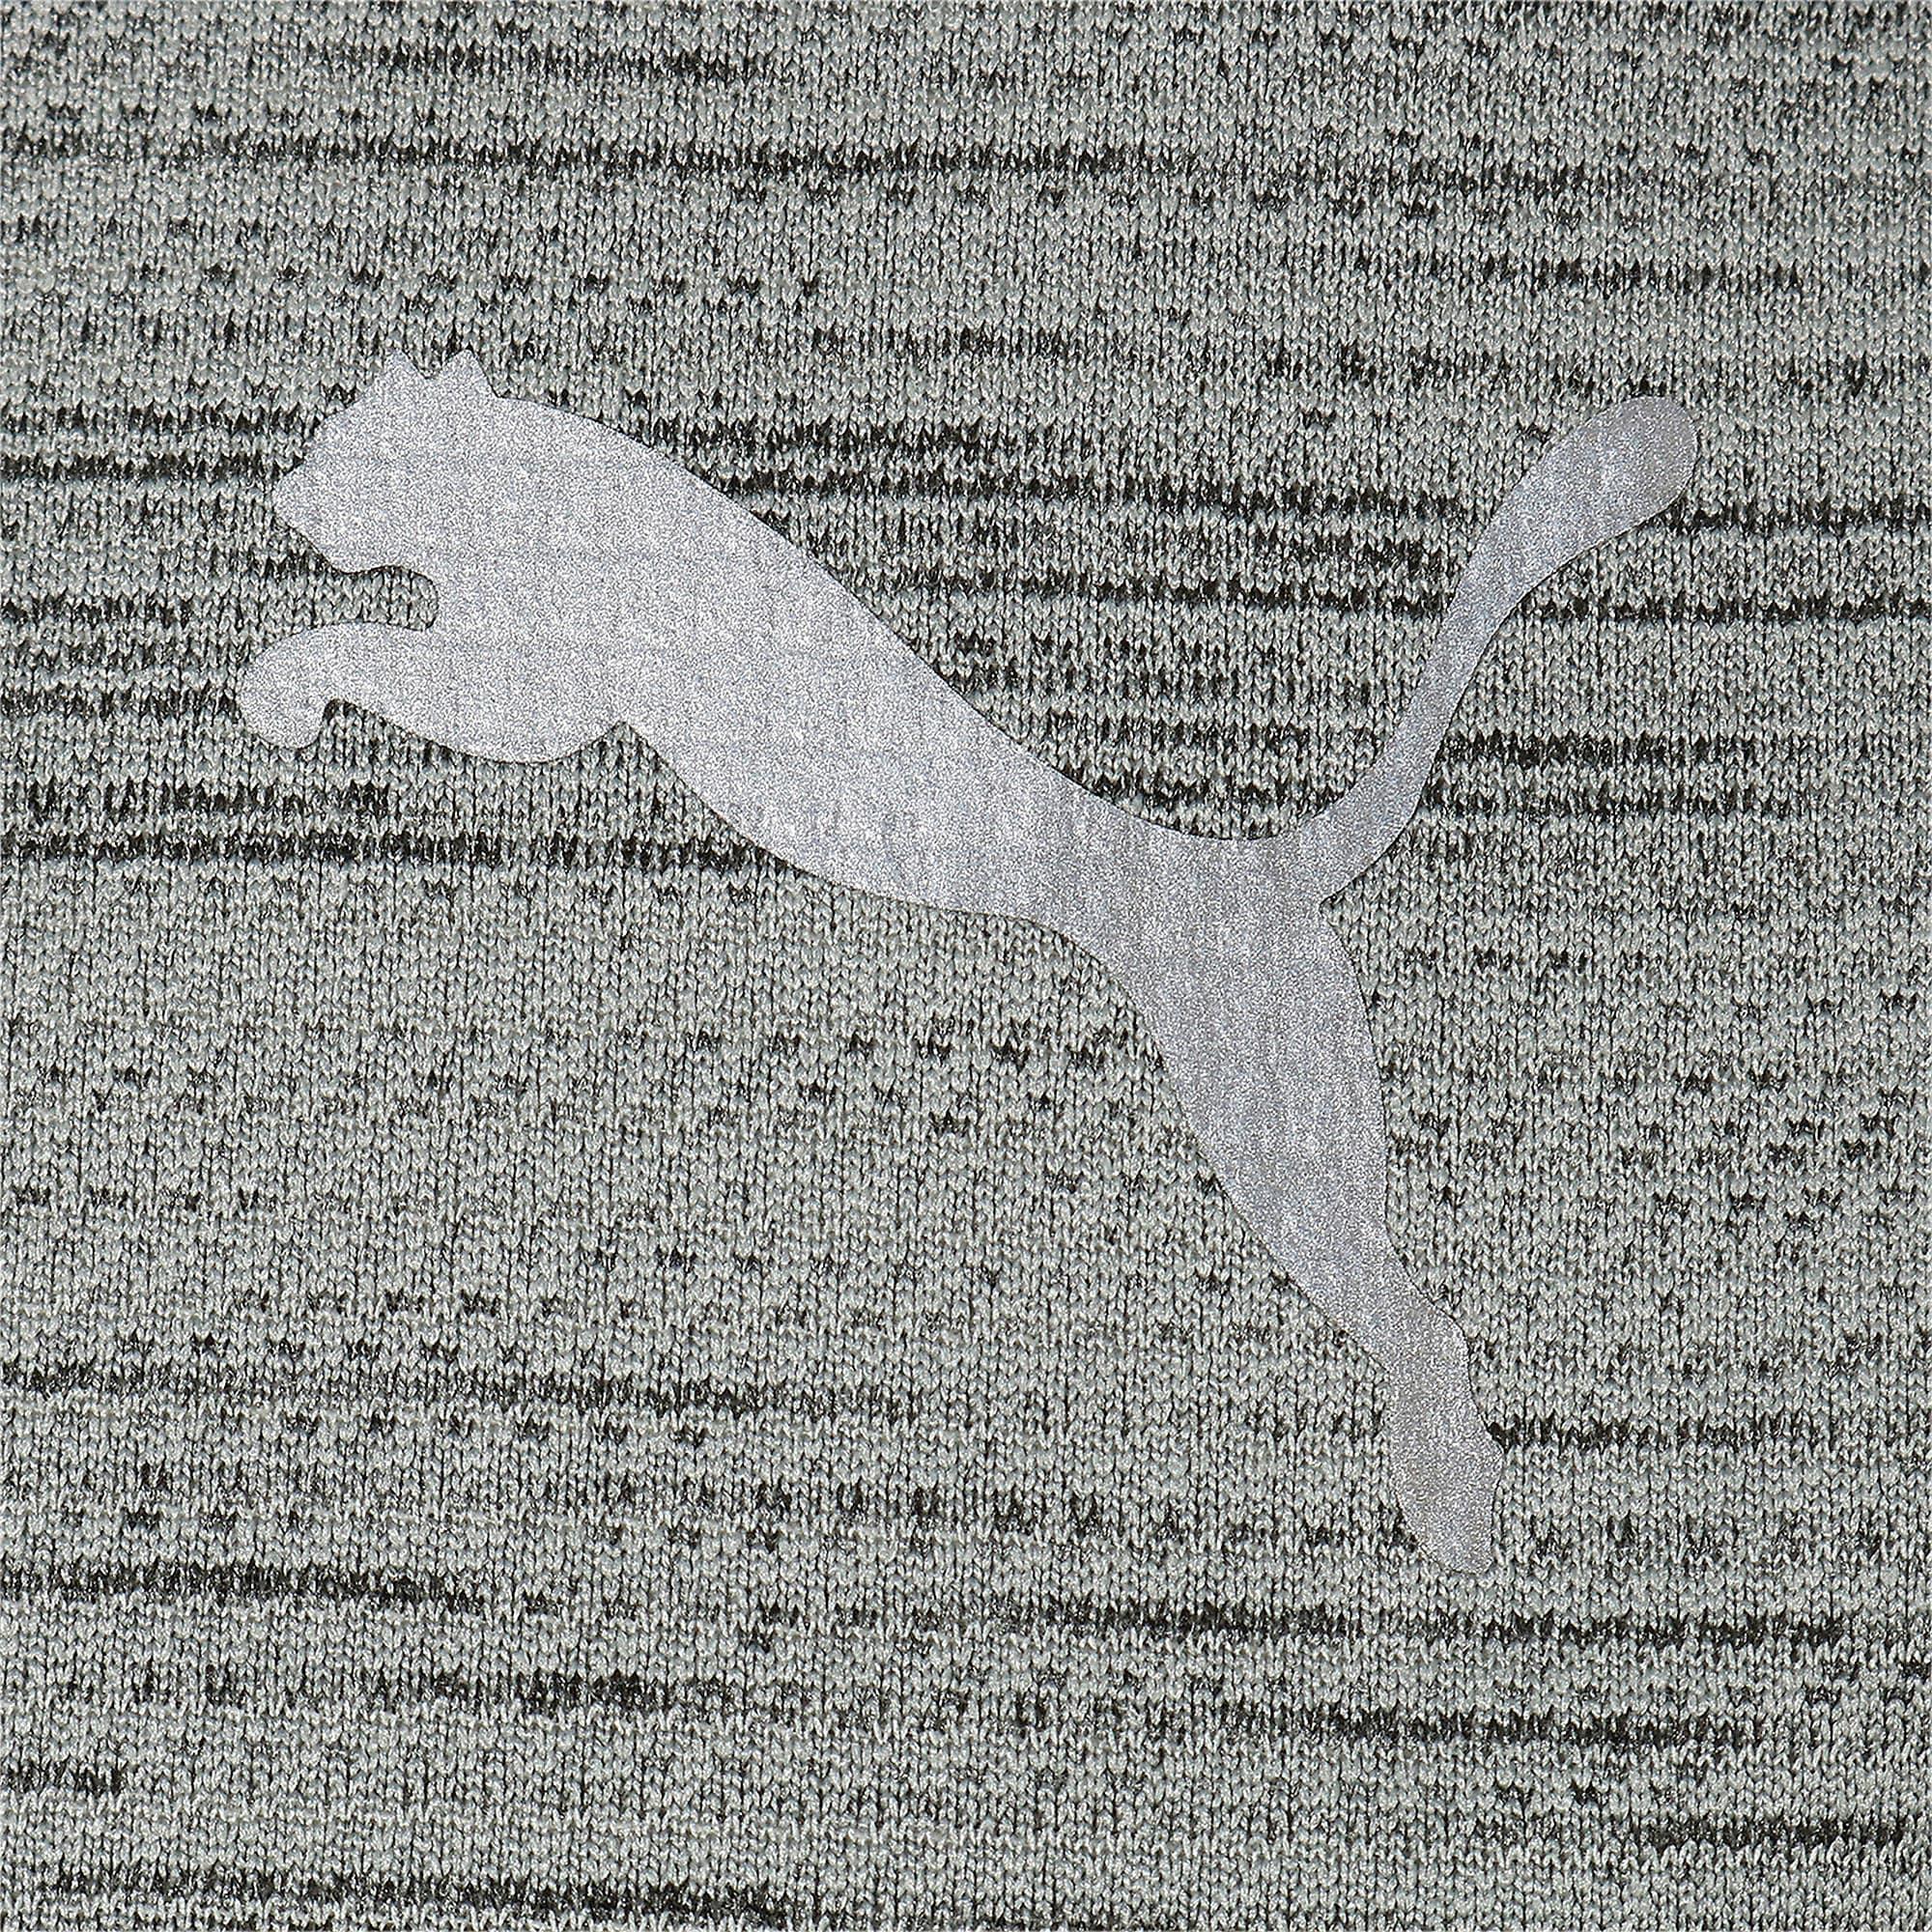 Thumbnail 7 of LAST LAP ヘザー SS ランニング Tシャツ 半袖, Medium Gray Heather, medium-JPN